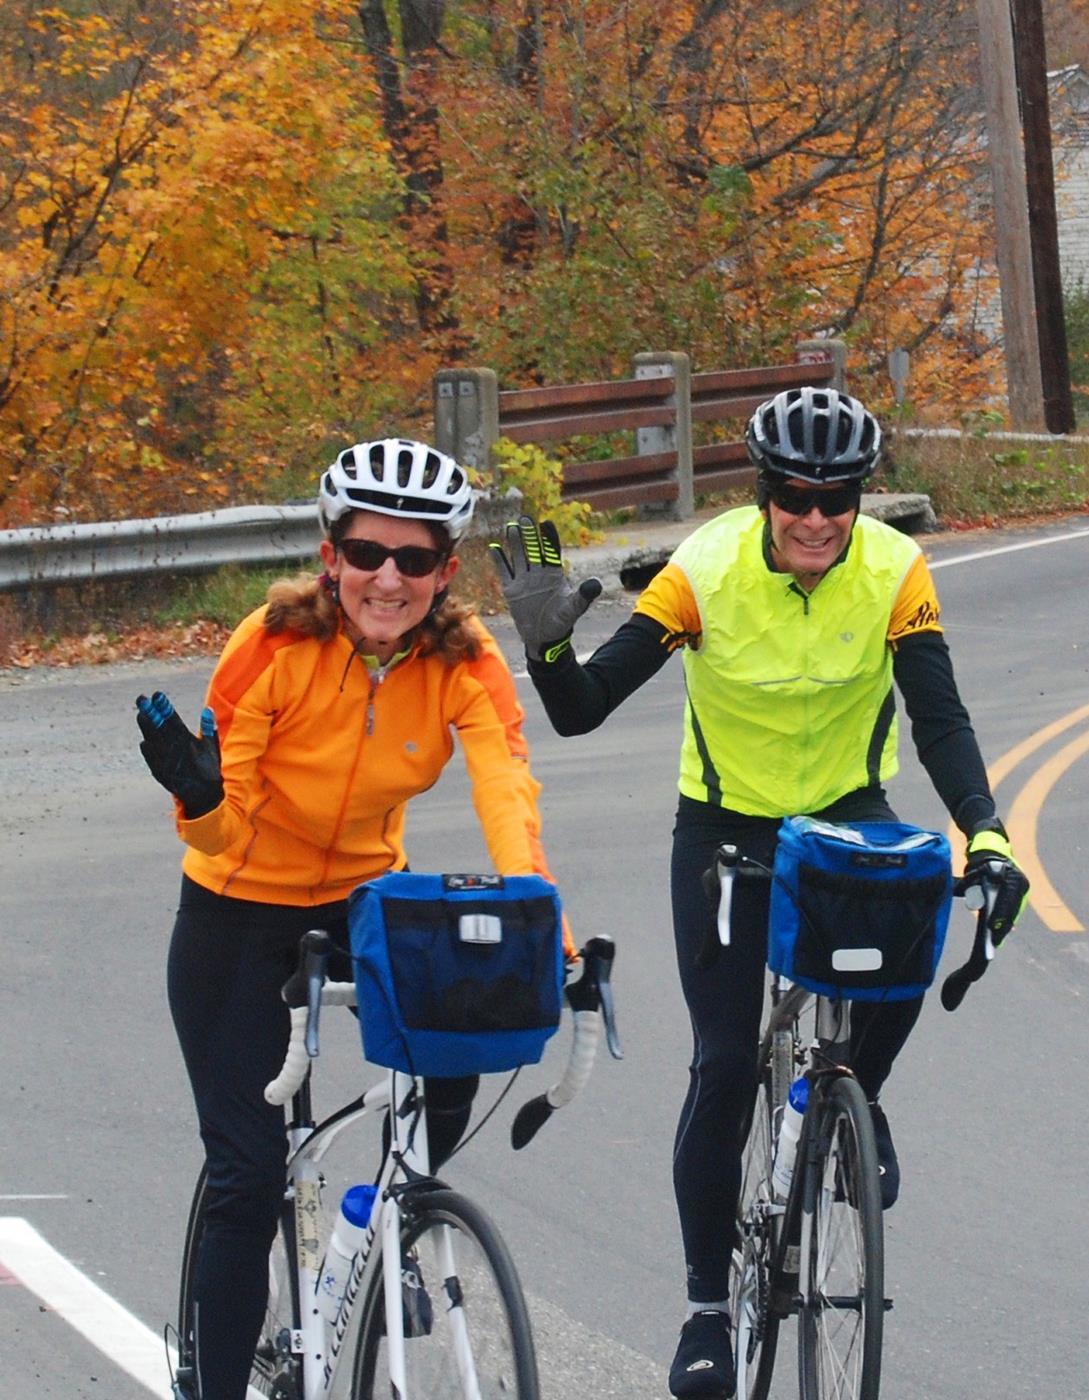 woodstock vt vacation bike tour great freedom adventures 2